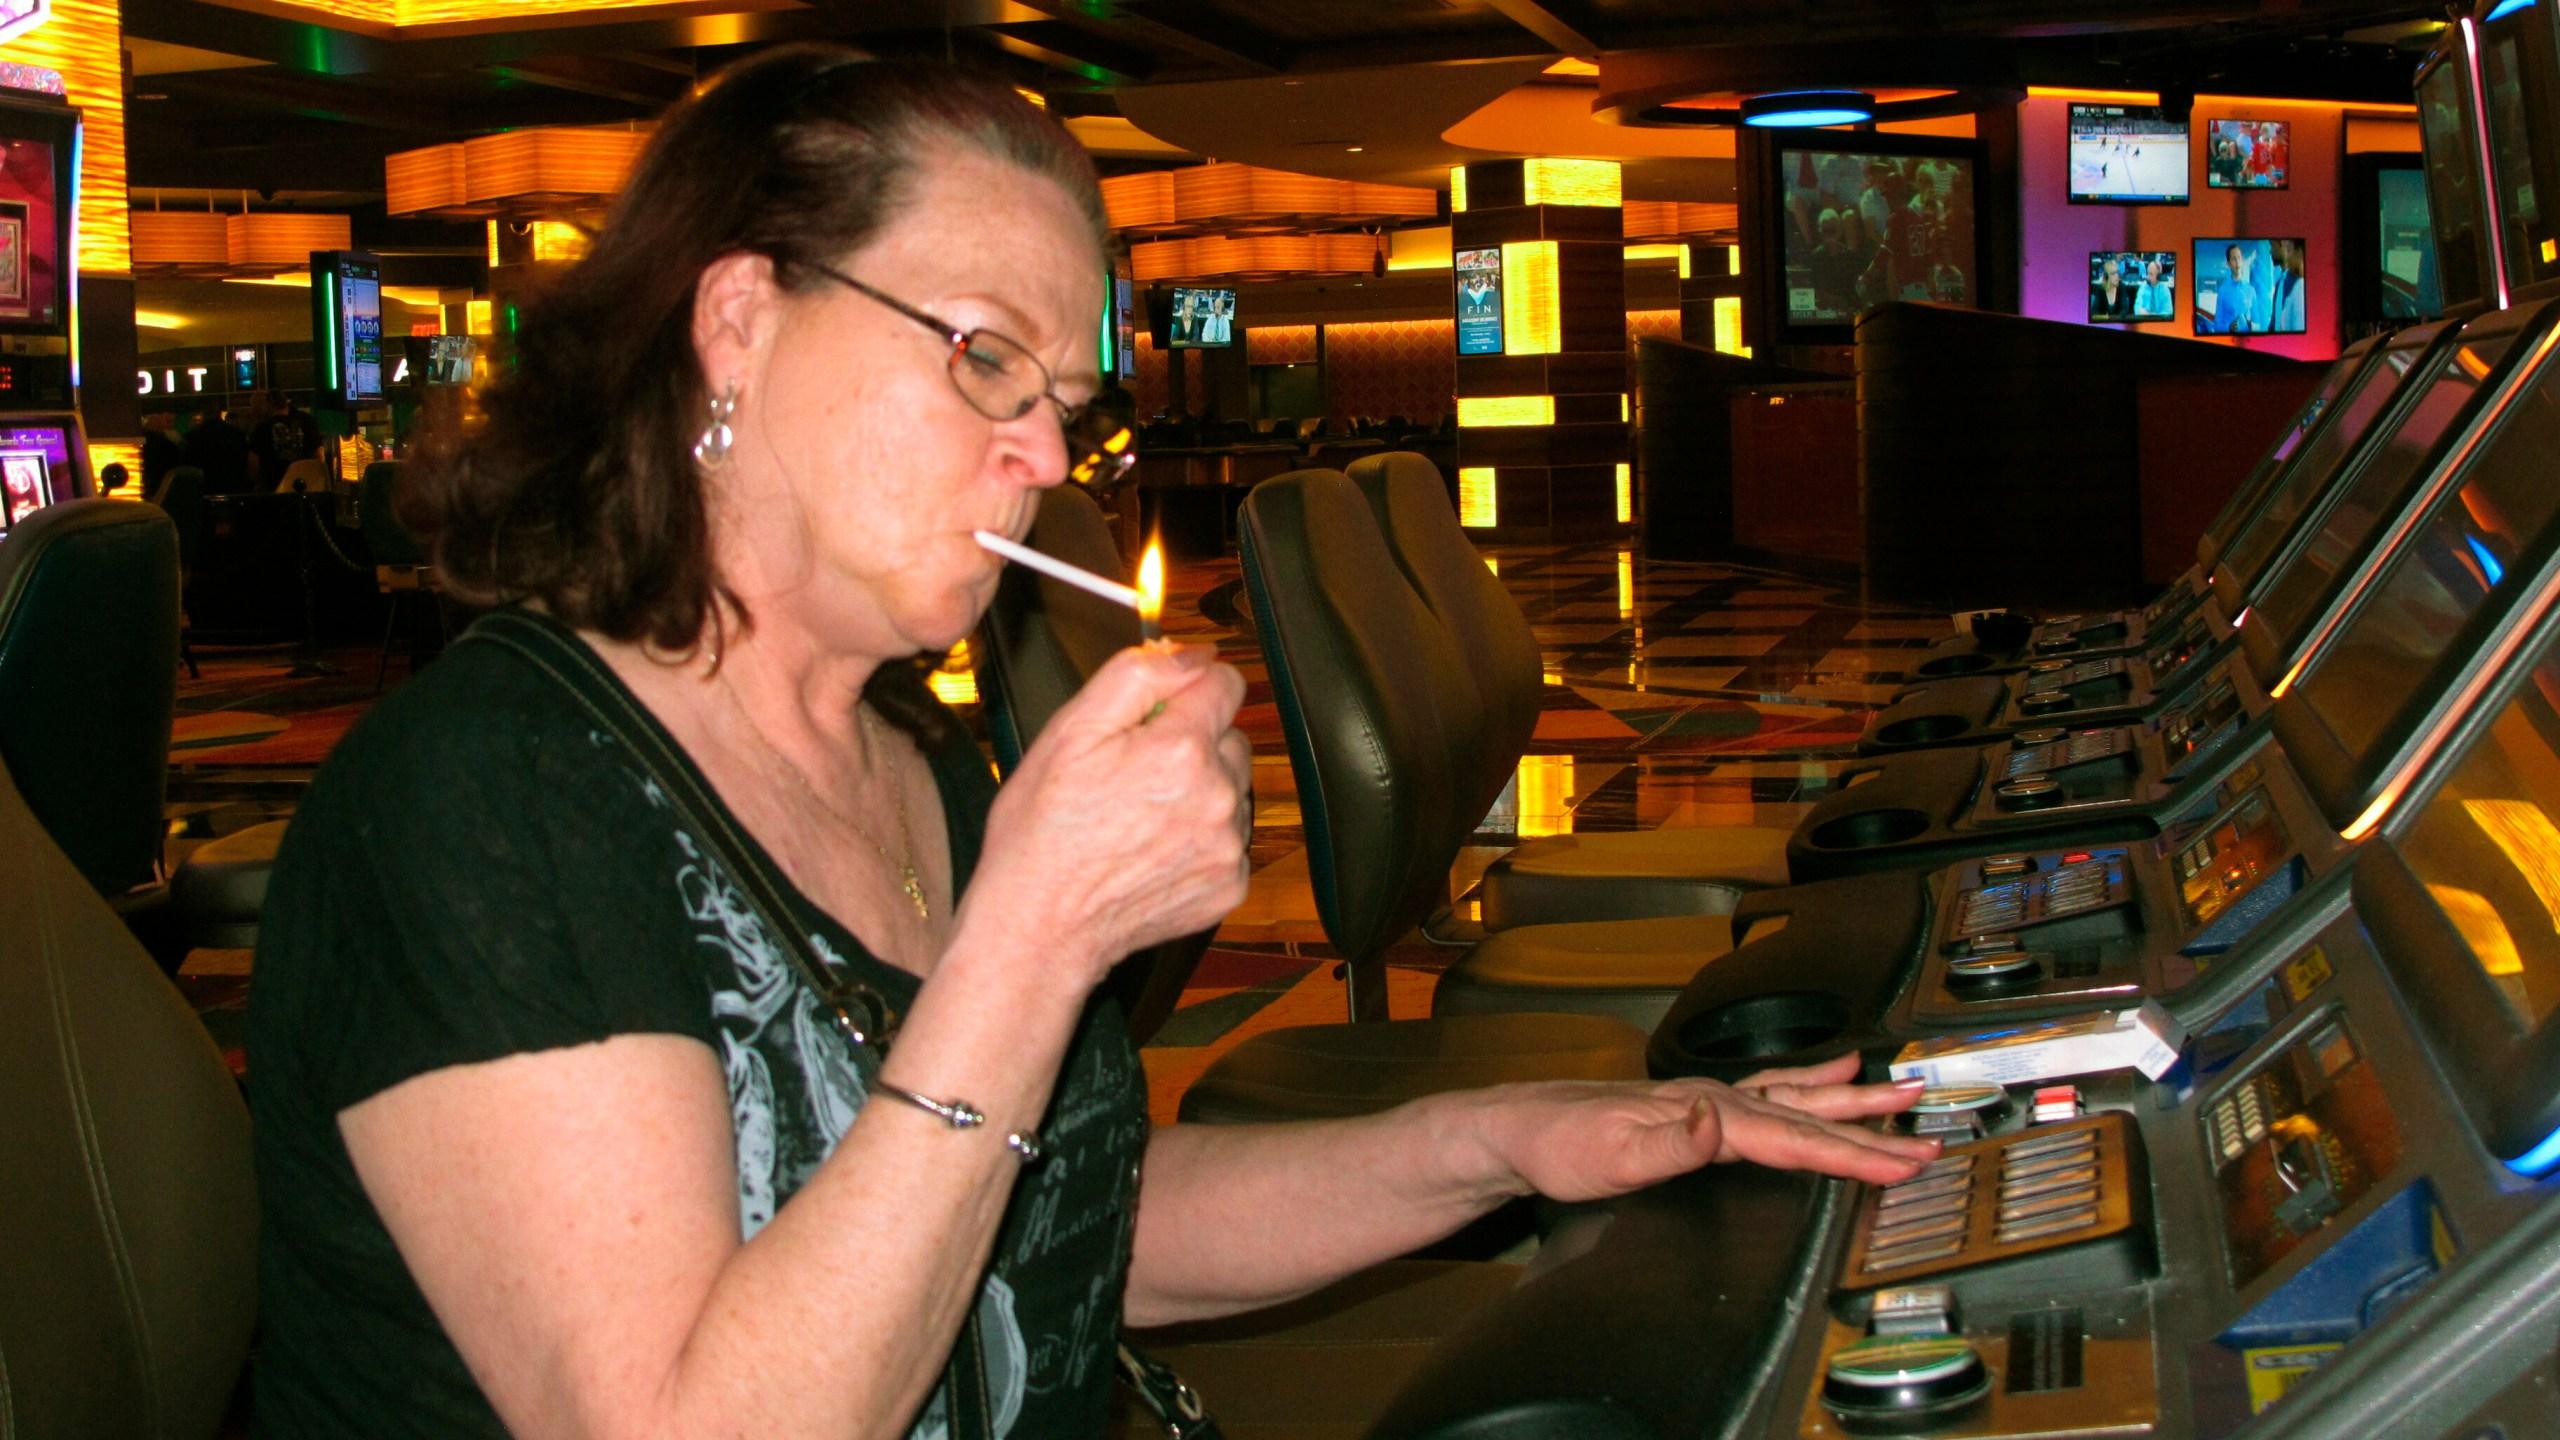 NJ casino patron lights cigarette